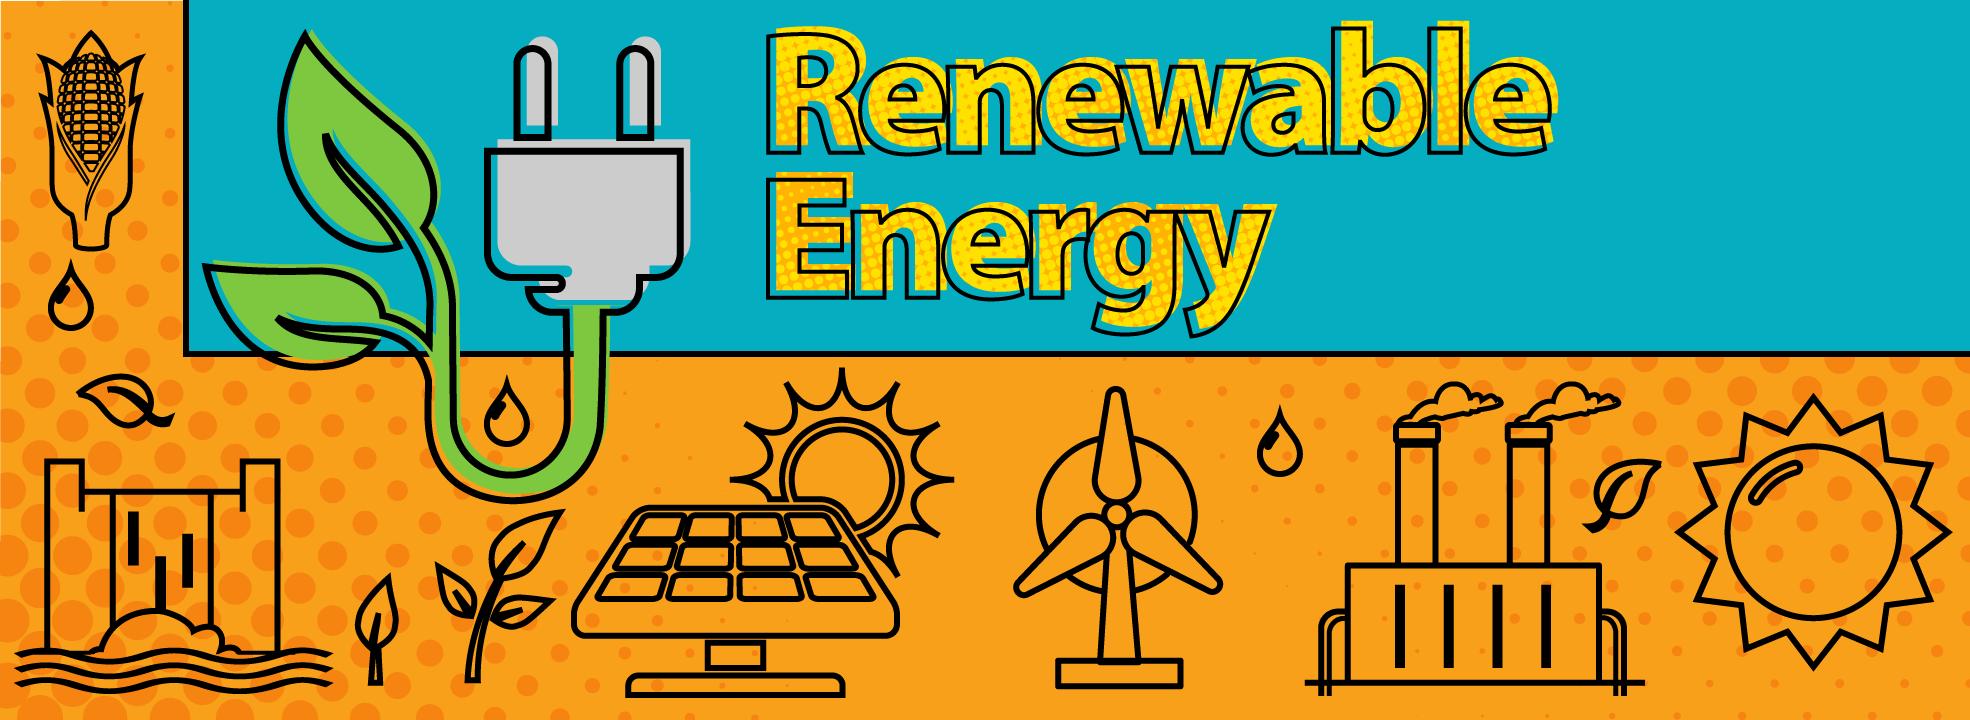 Renewable energy solar wind biomass geothermal hydropower